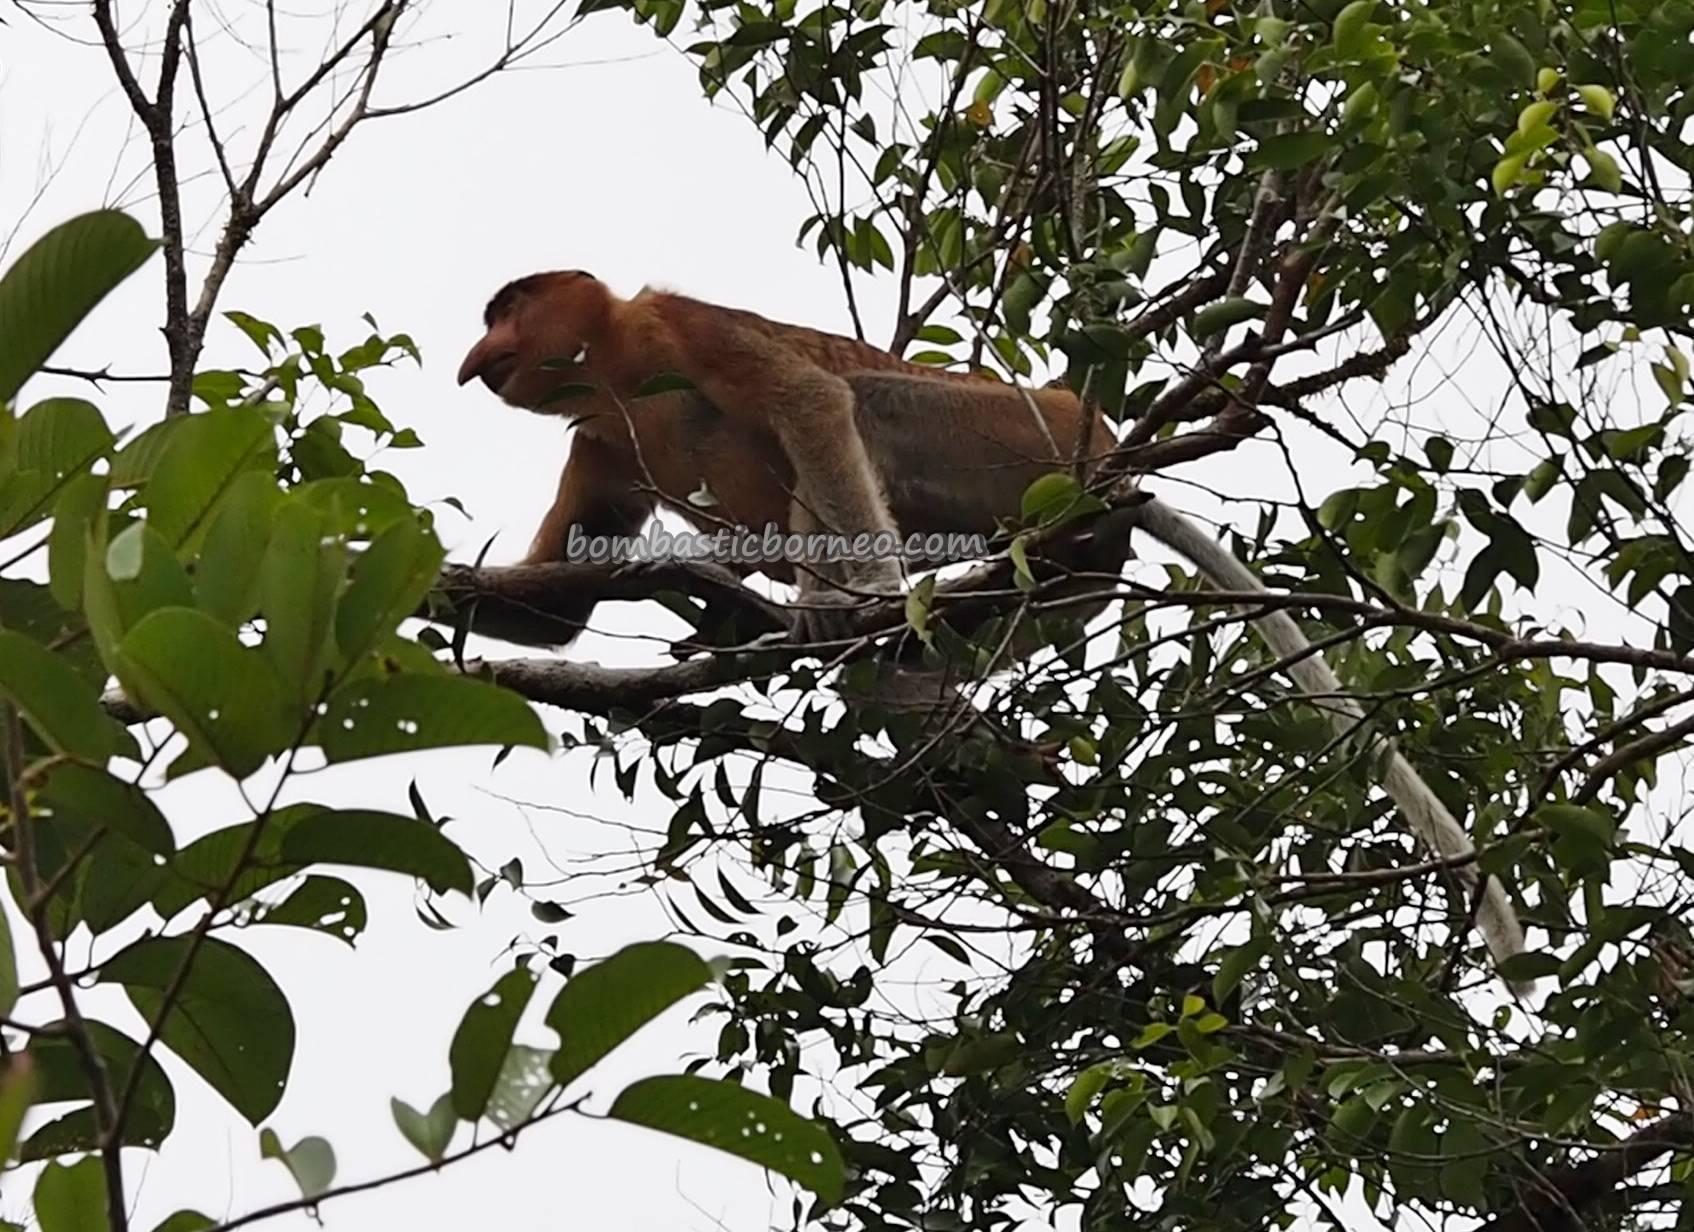 backpackers, Taman Negara, peat swamp forest, primate, wildlife, Protected Species, adventure, river safari, monyet belanda, Borneo, Tourism, tourist attraction, travel guide, 沙捞越婆罗洲, 长鼻猴